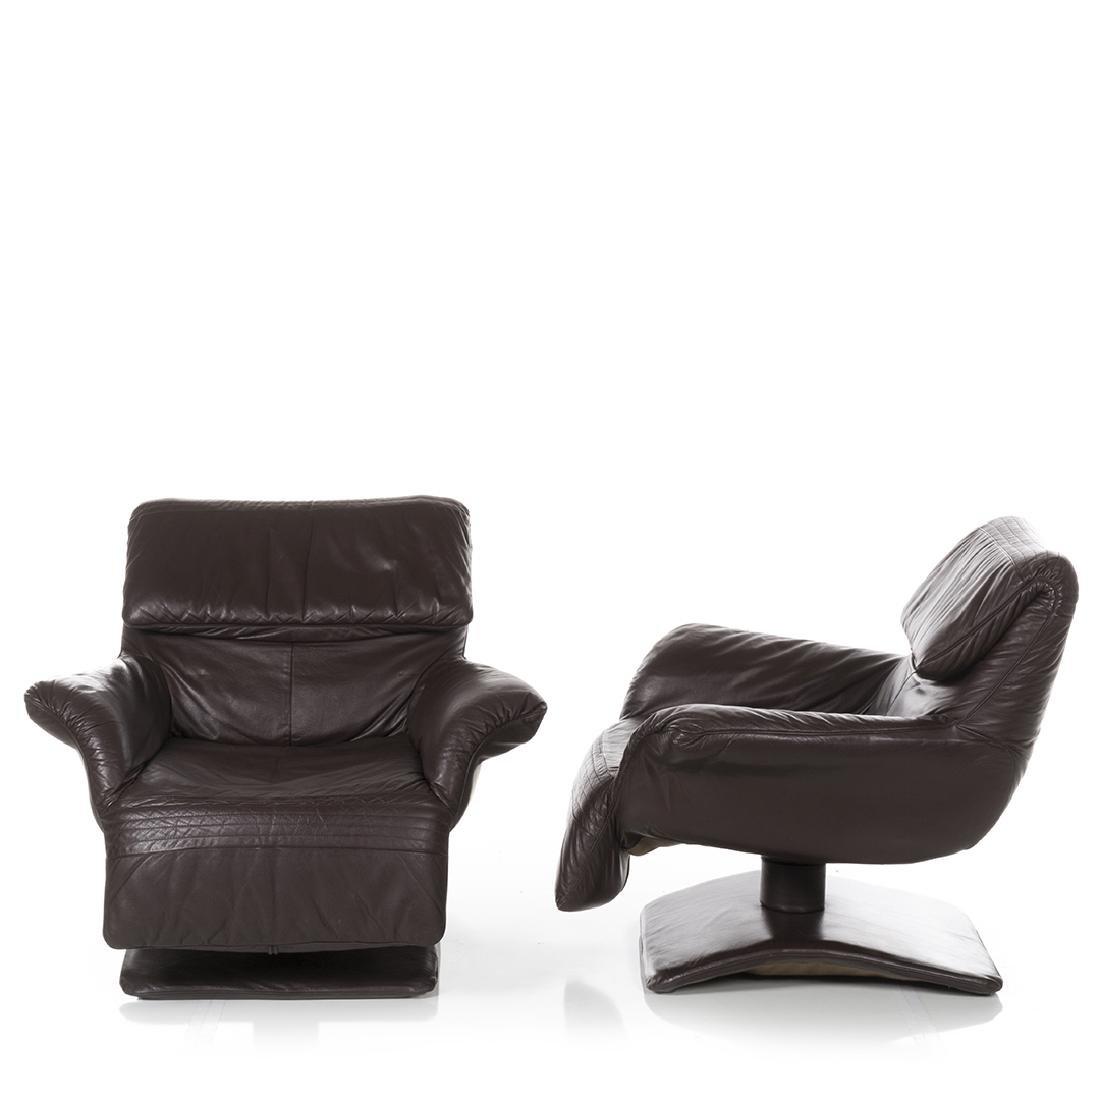 Scandinavian Leather Club Chairs (2) - 3